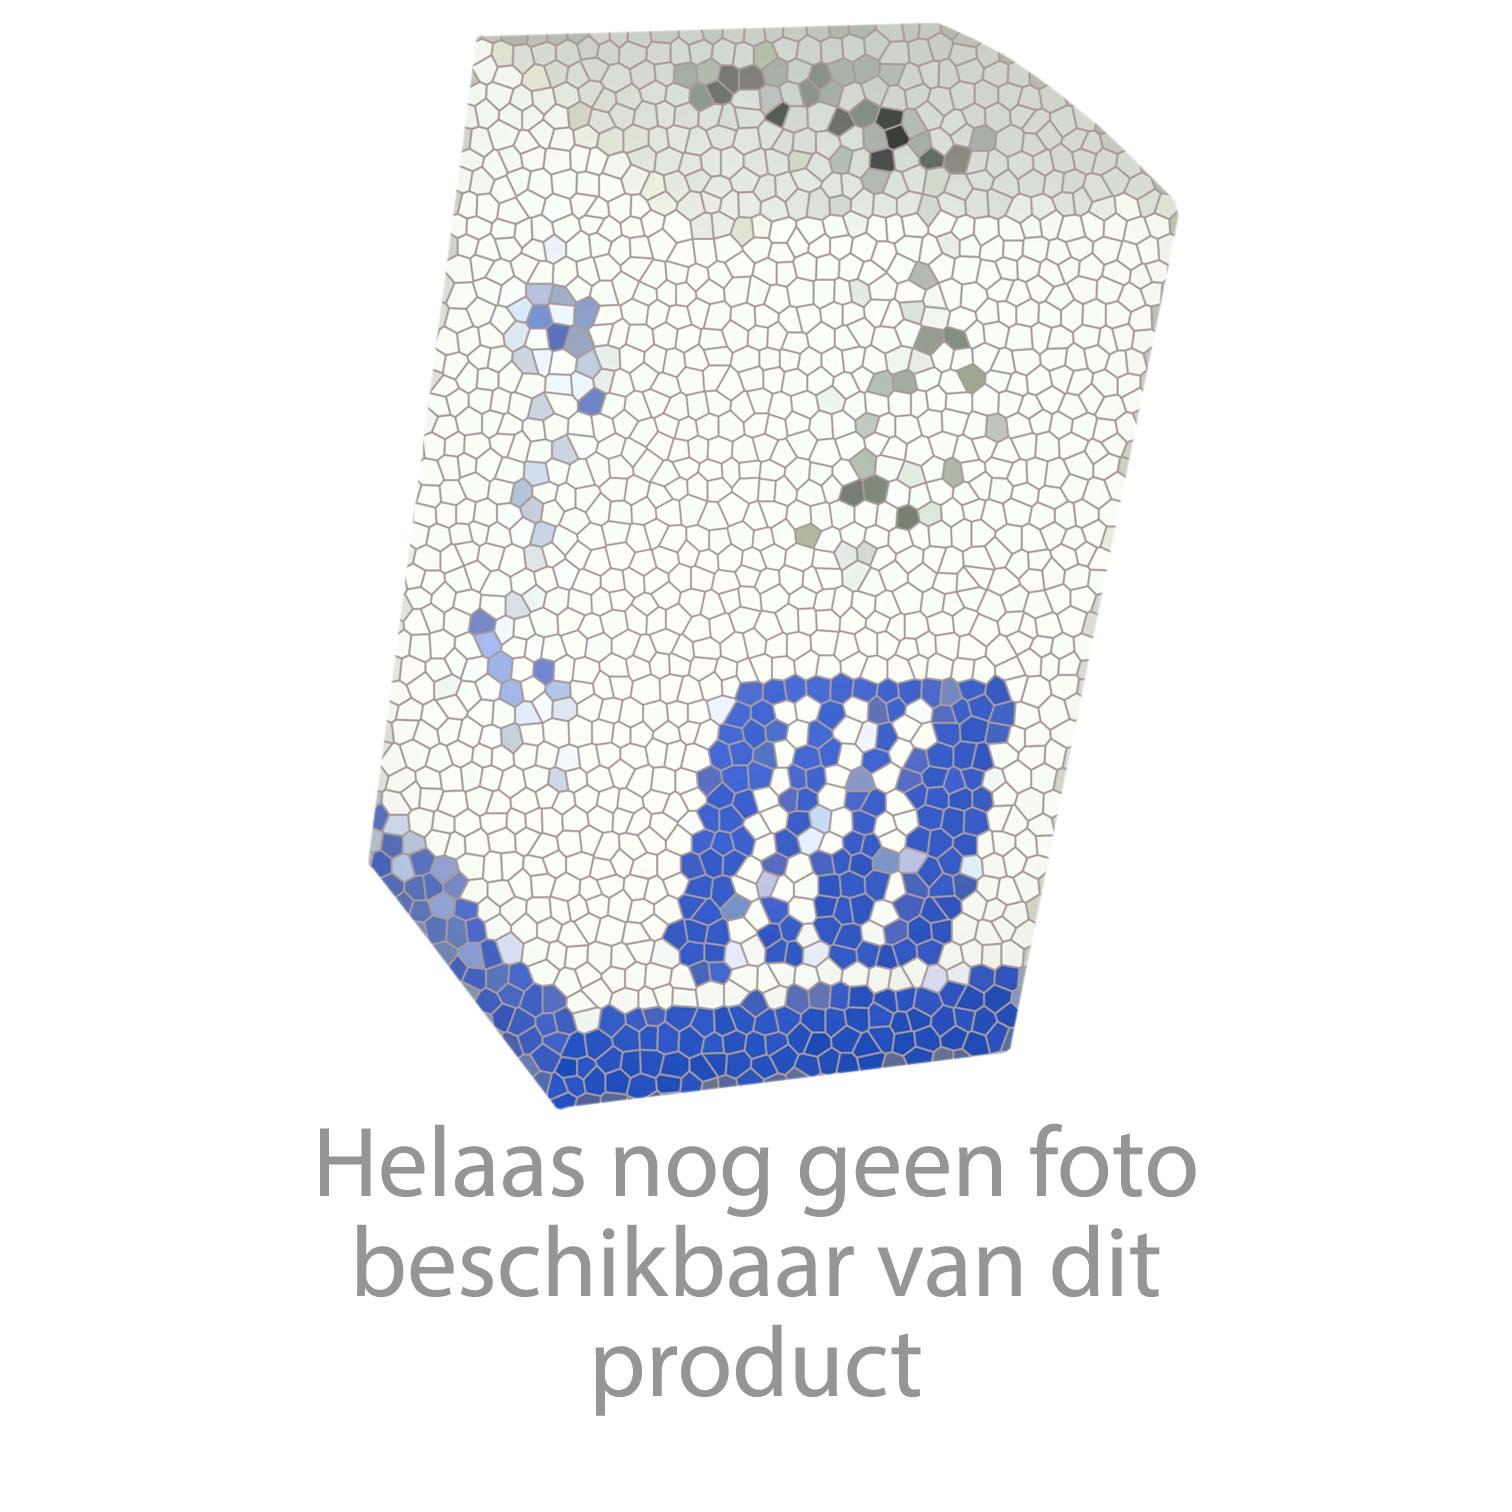 Grohe onderdelen Allure Brilliant 3-Gats Wastafelmengkraan Hoog M/Waste 20344000